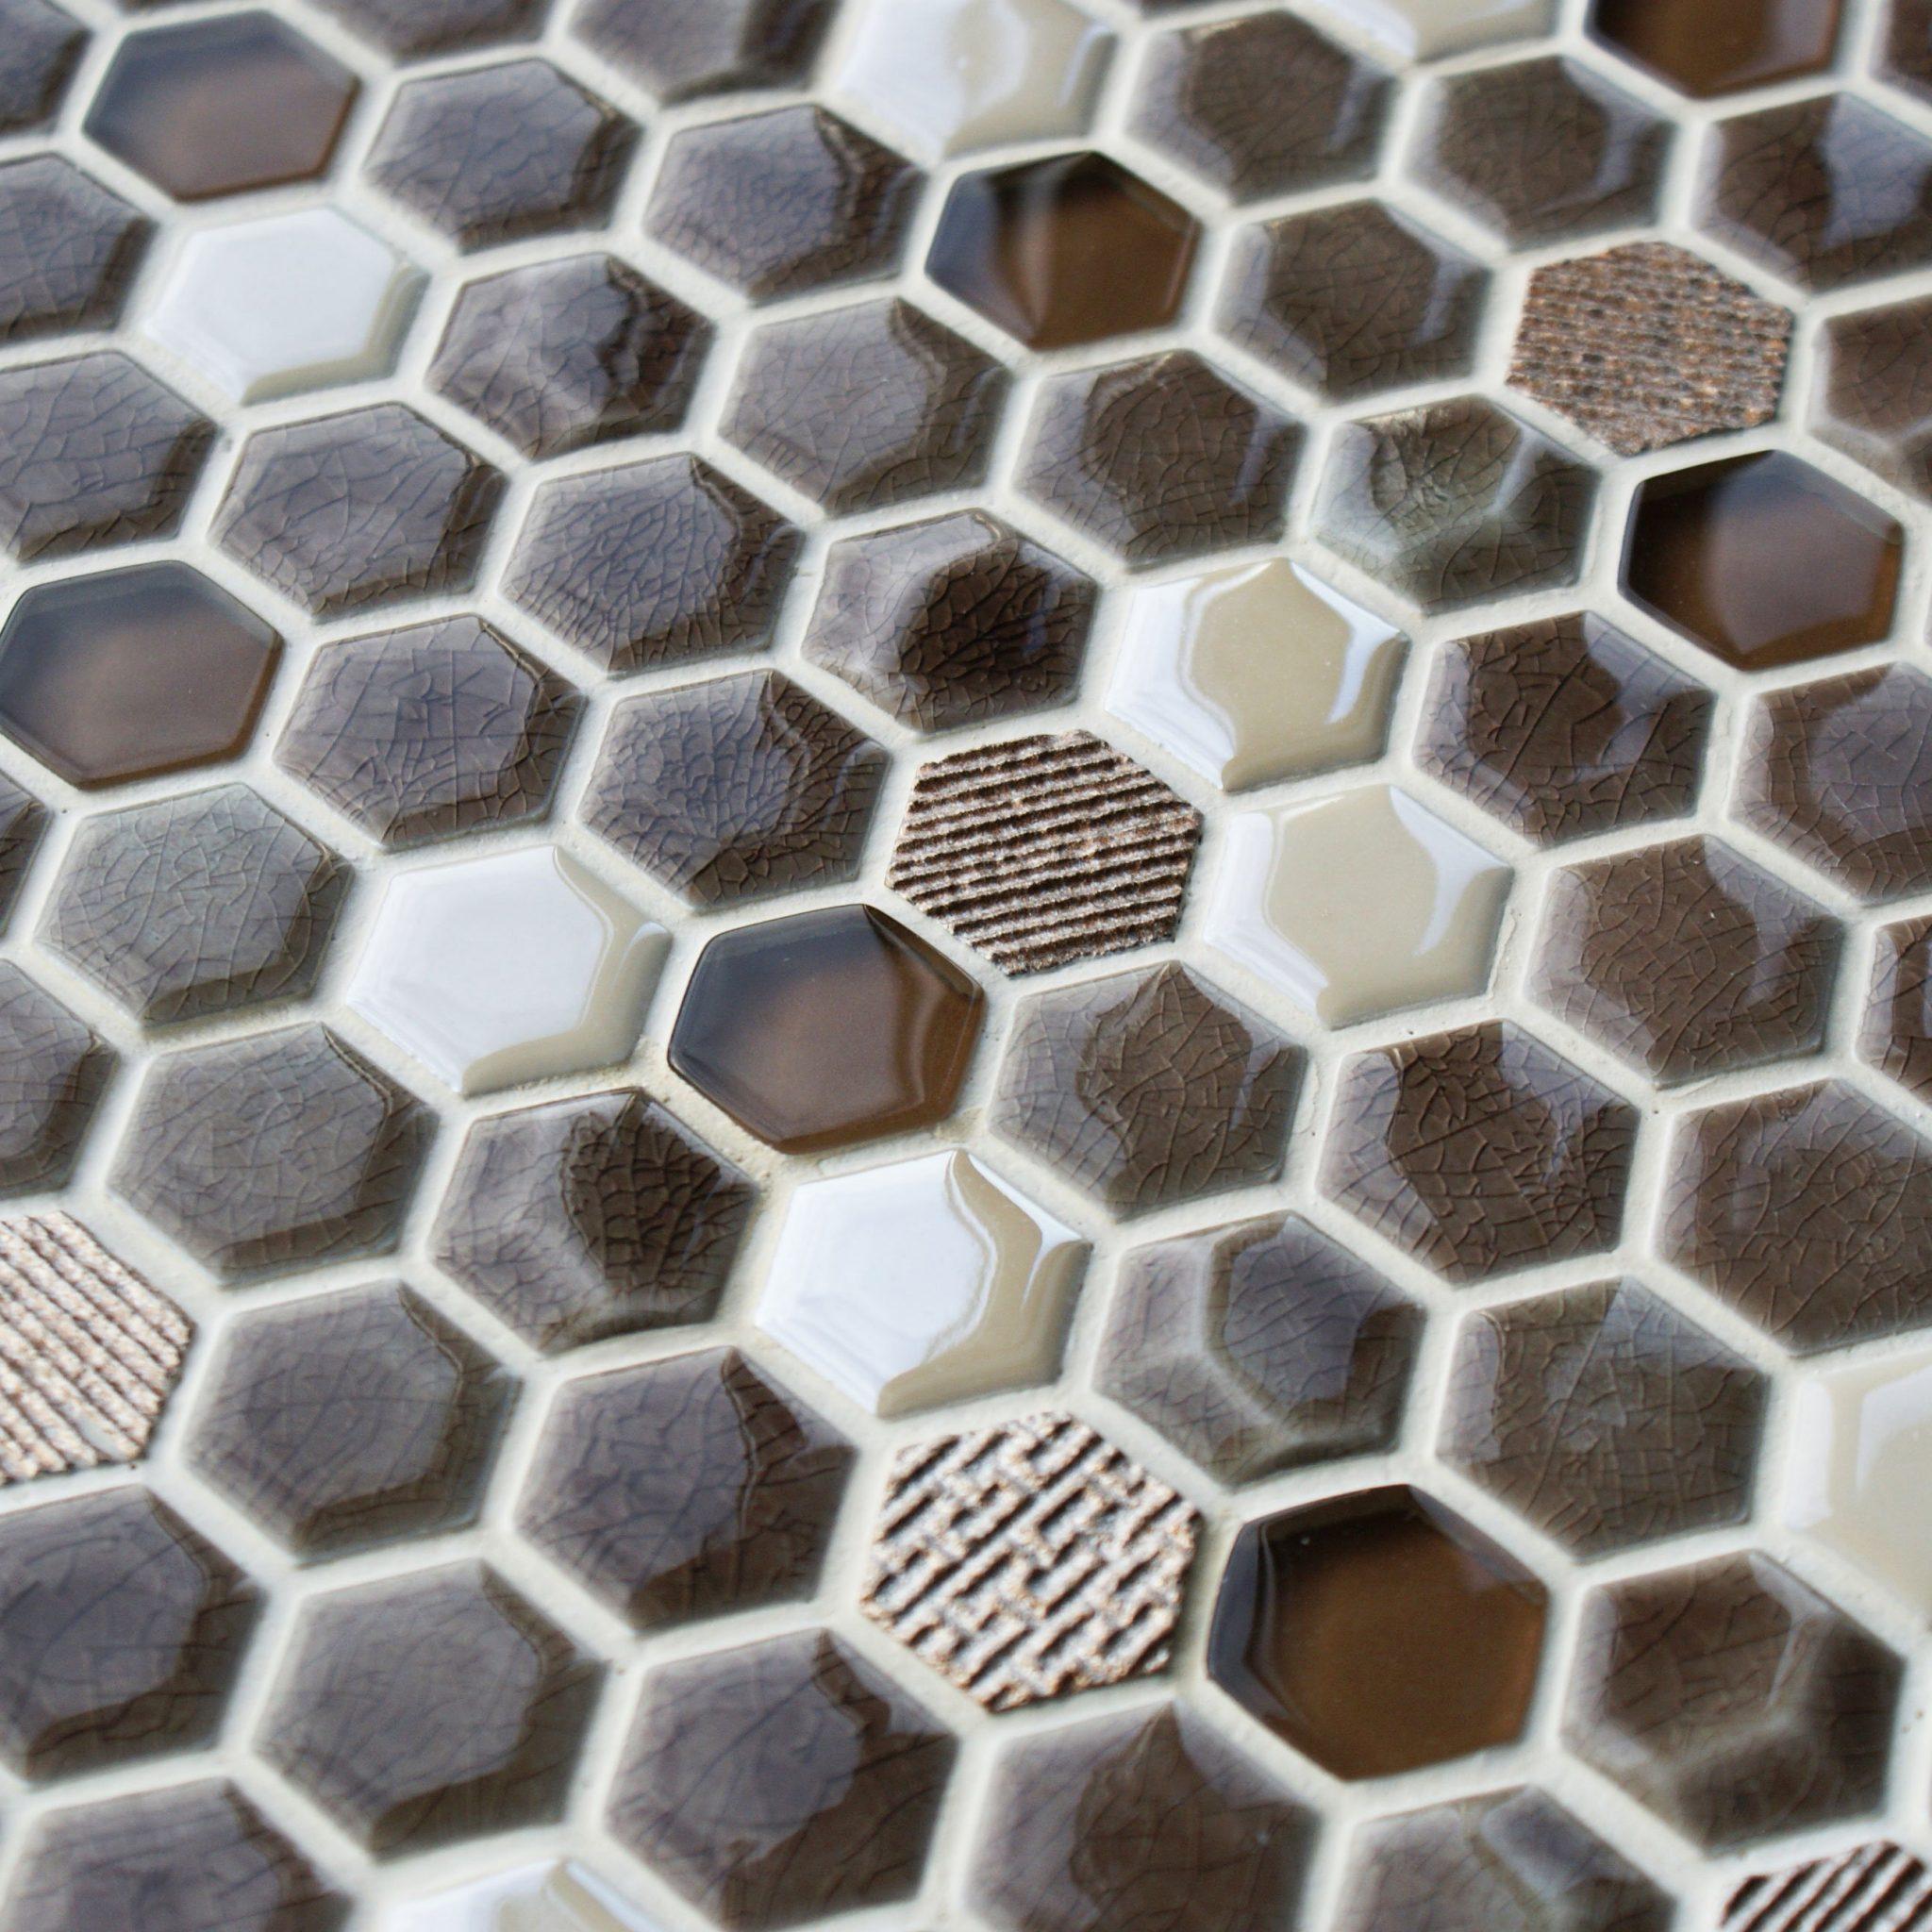 Honeycomb fawn mosaic tiles